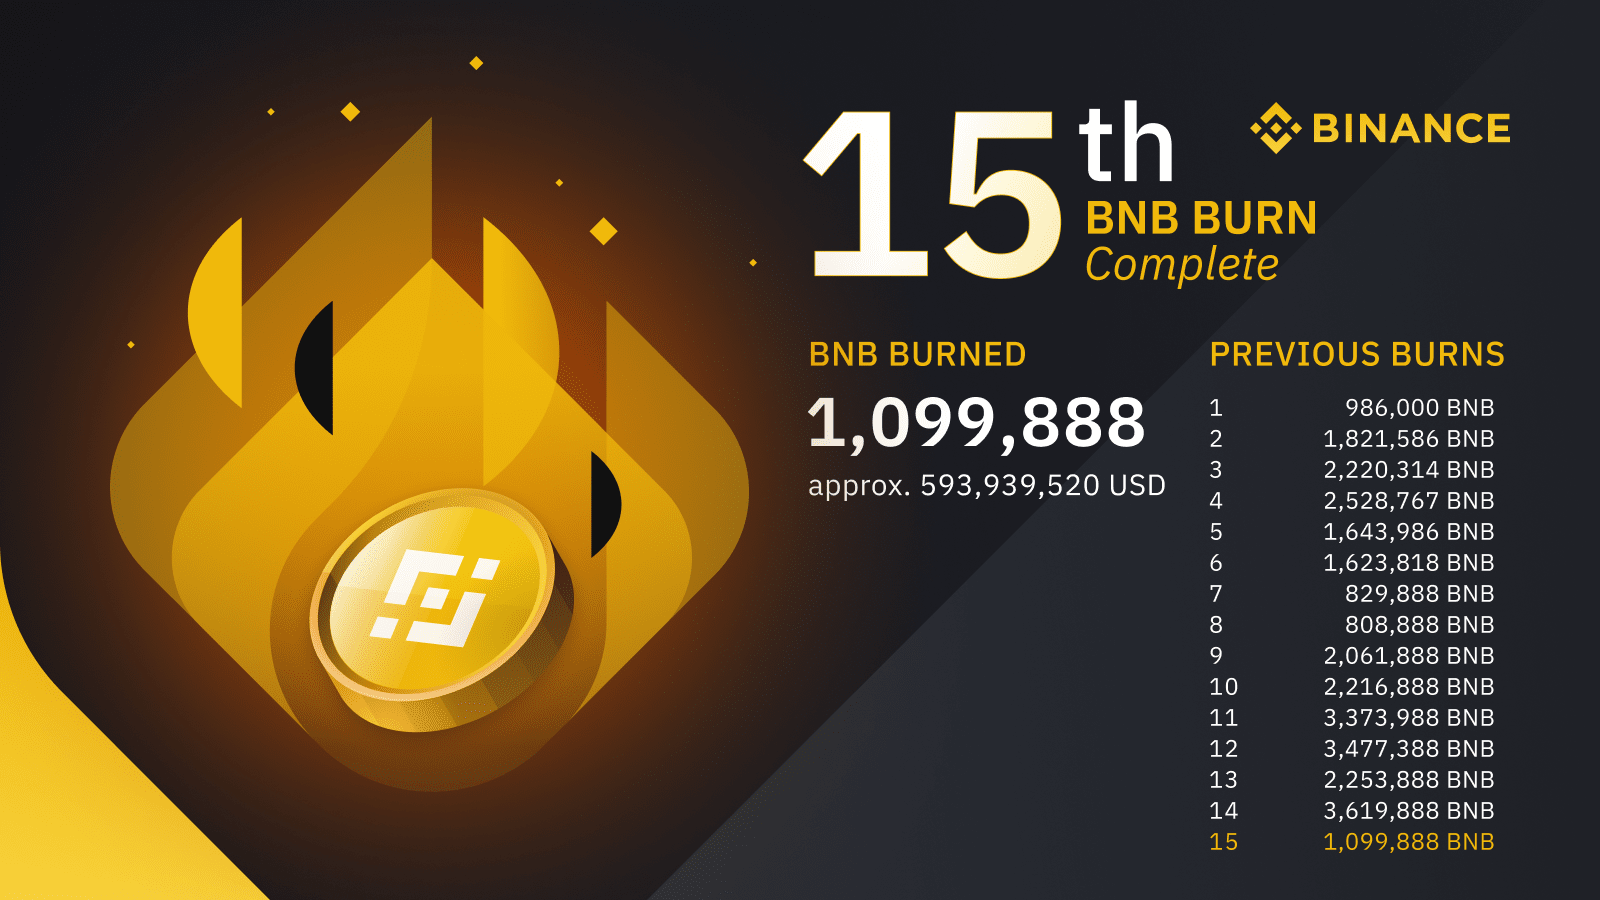 BNB burn history as of June 2021. Source: Binance